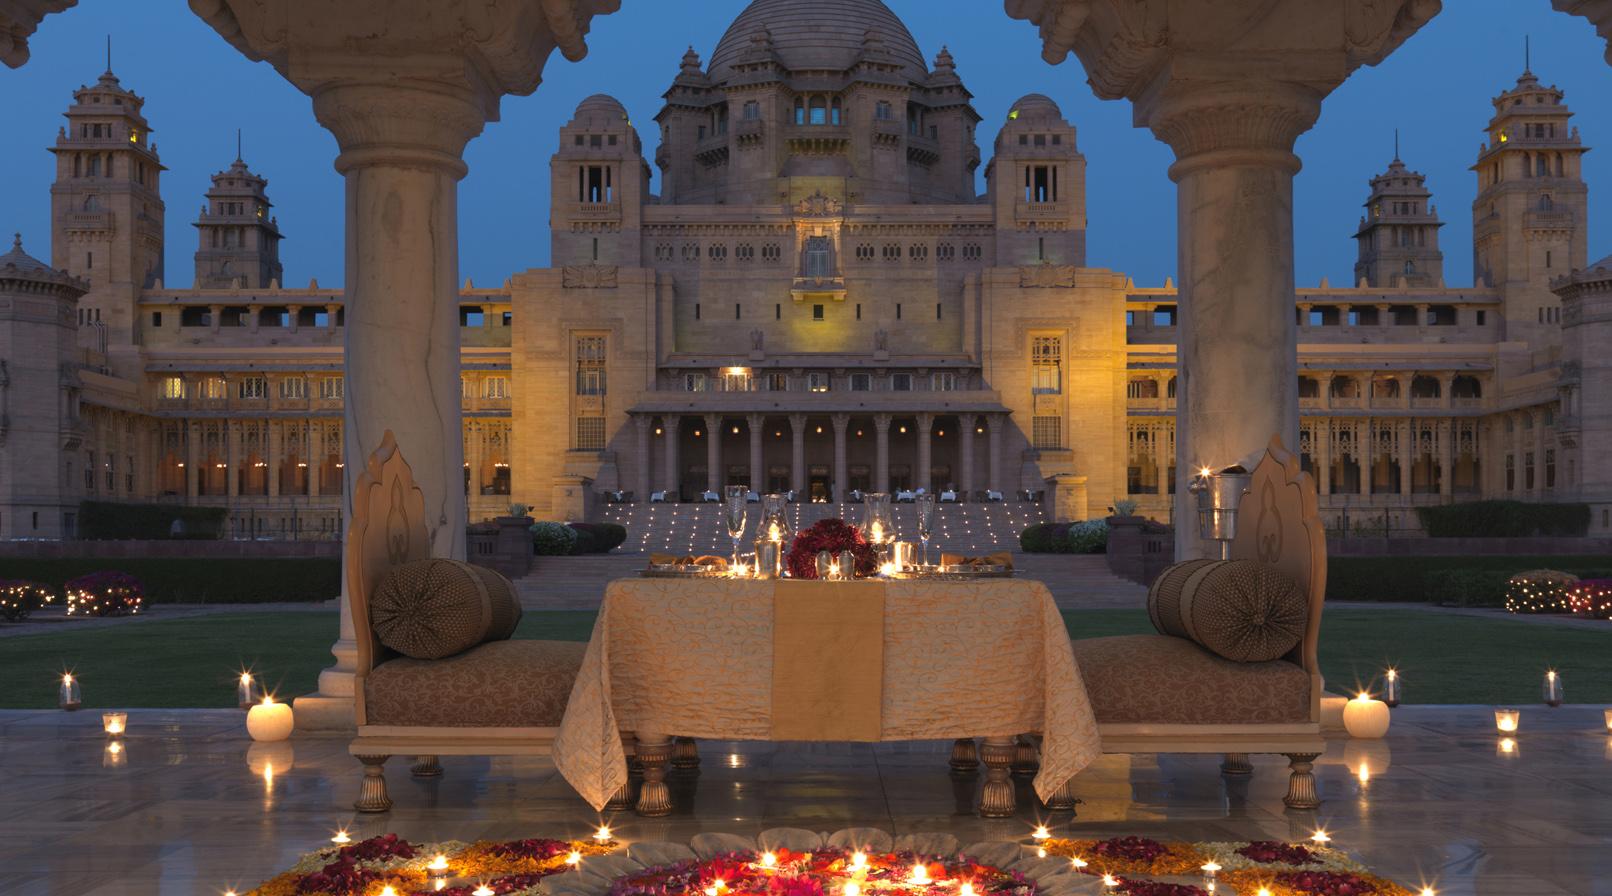 Umaid Bhawan Palace 酒店